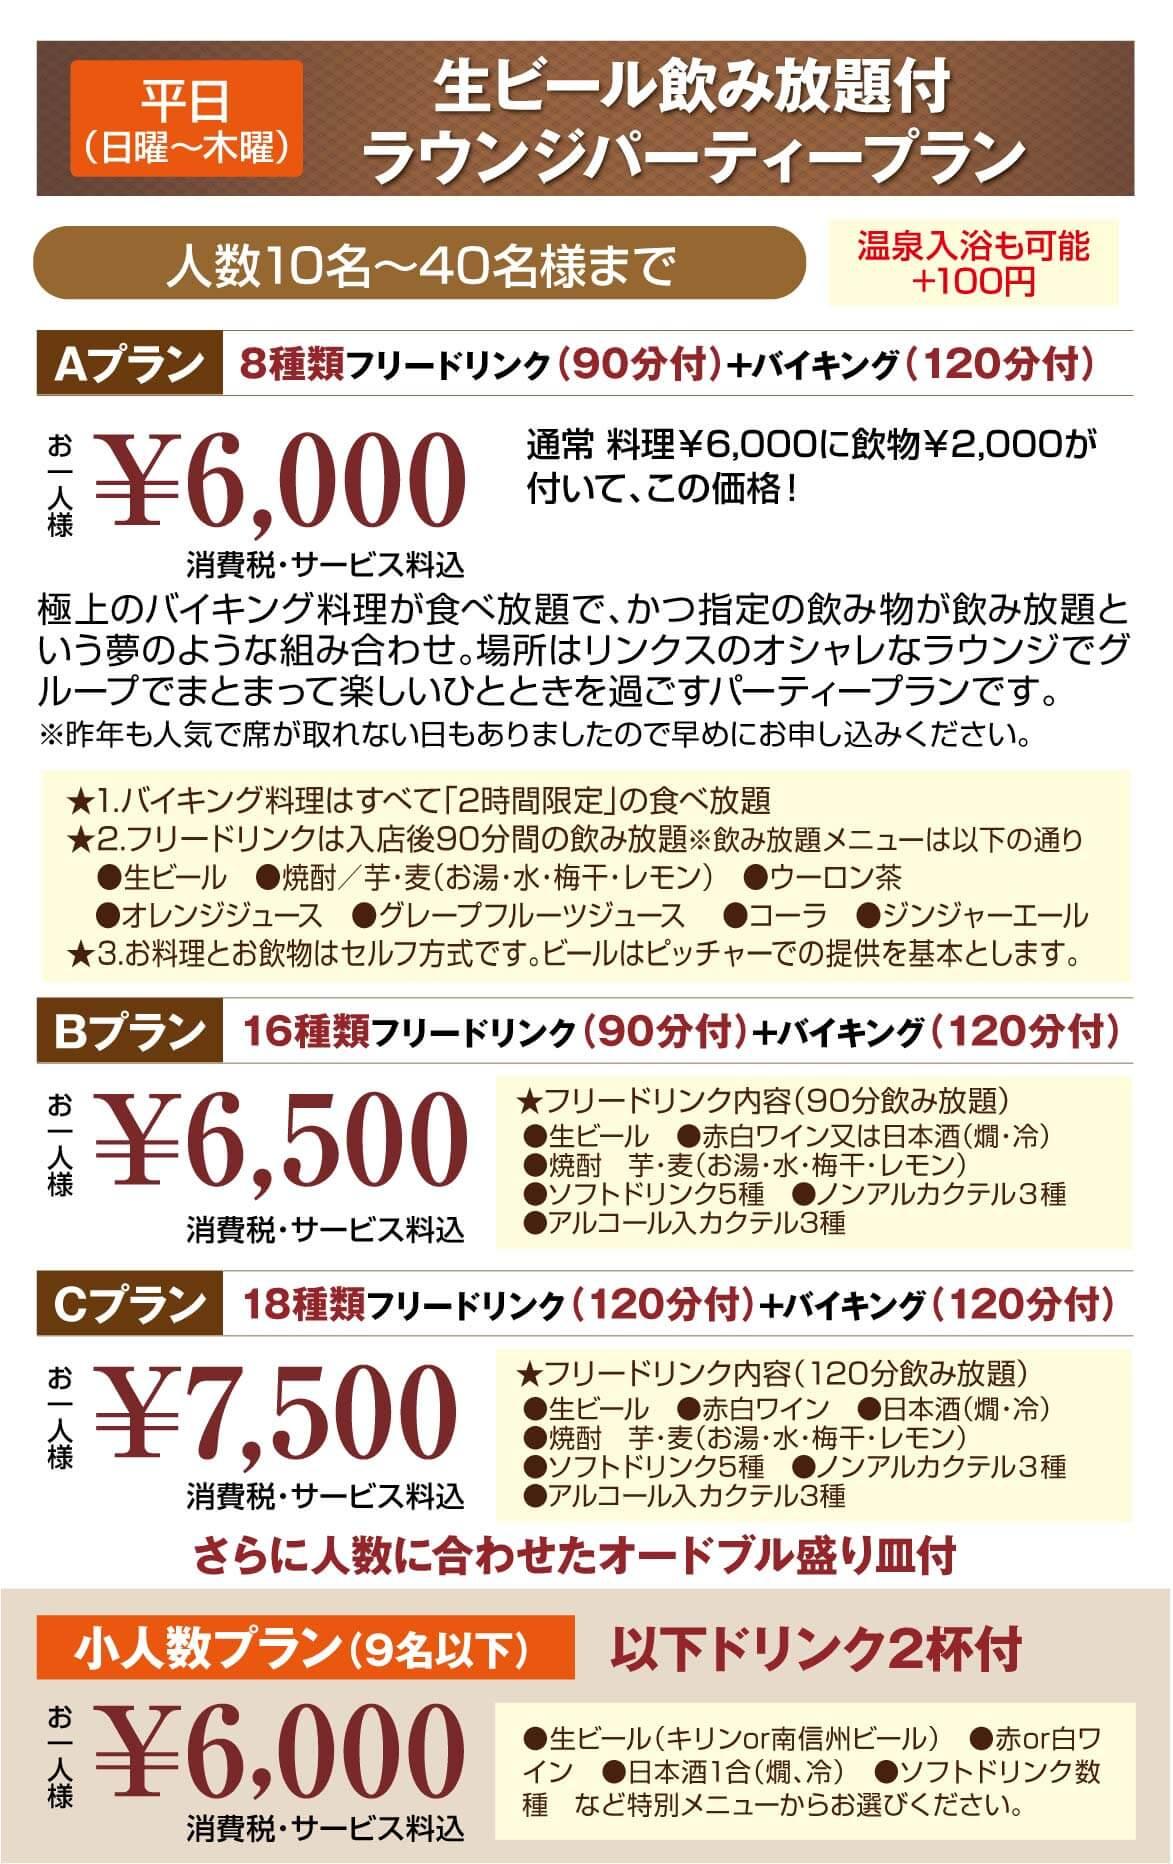 http://www.komagane-linx.co.jp/blogimages/kamiina201611-2-3.jpg